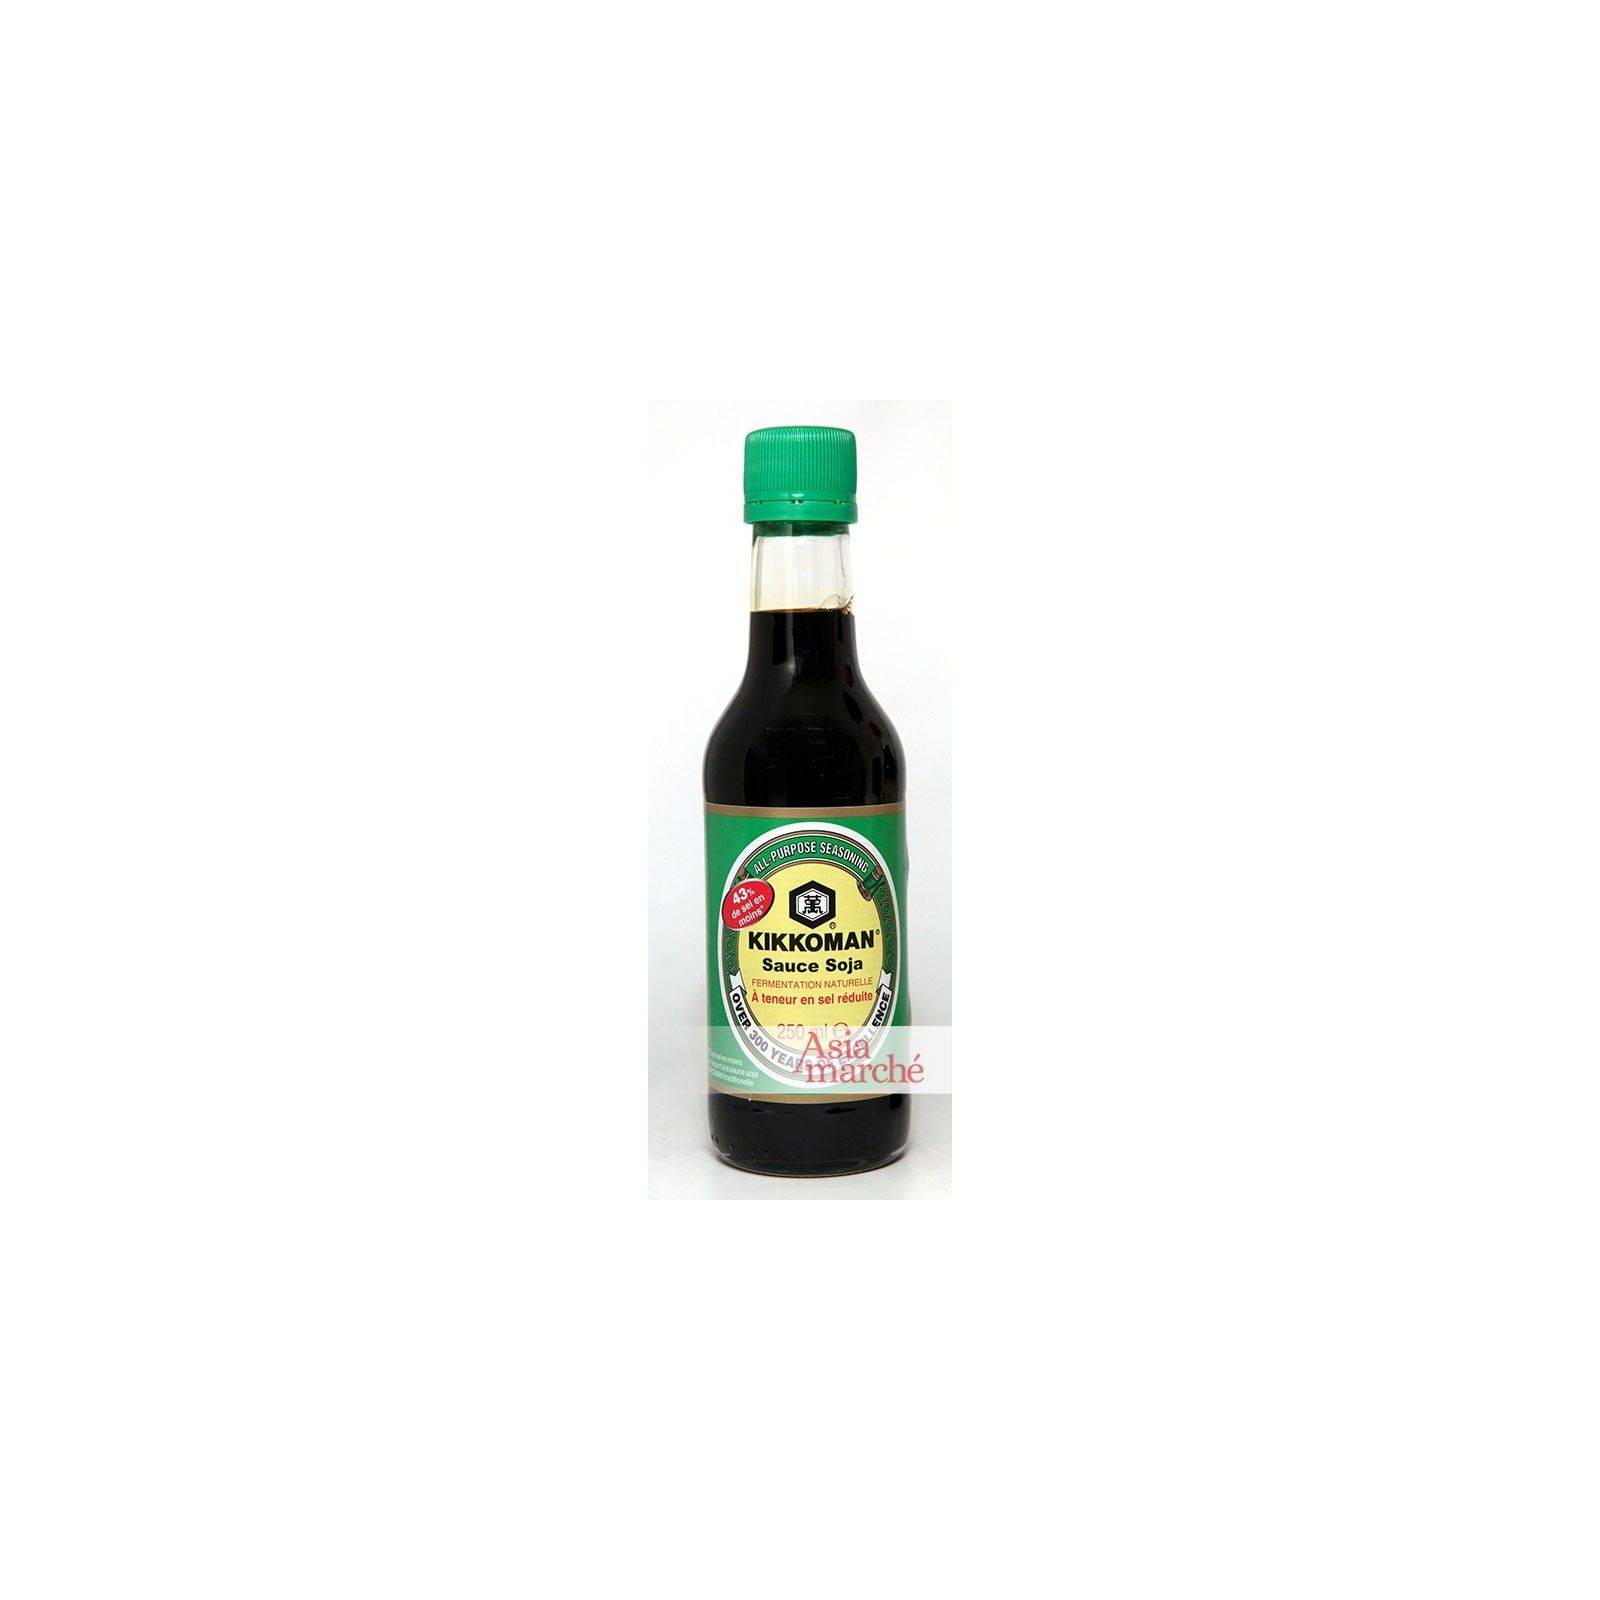 Asia Marché Sauce soja pauvre en sel Kikkoman 250ml